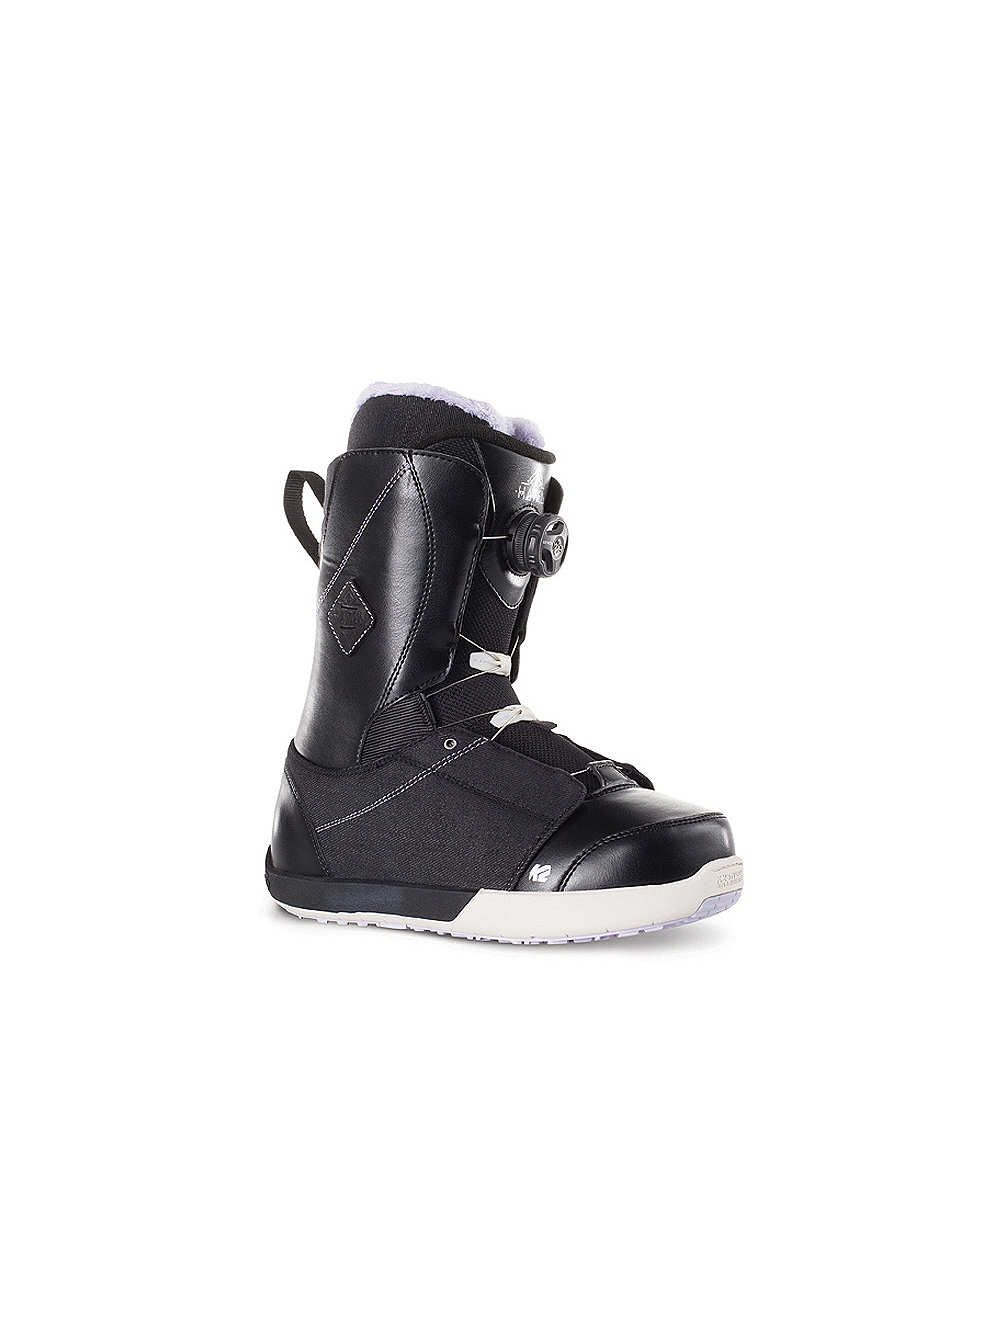 K2 Haven 2015 snowboard shoe